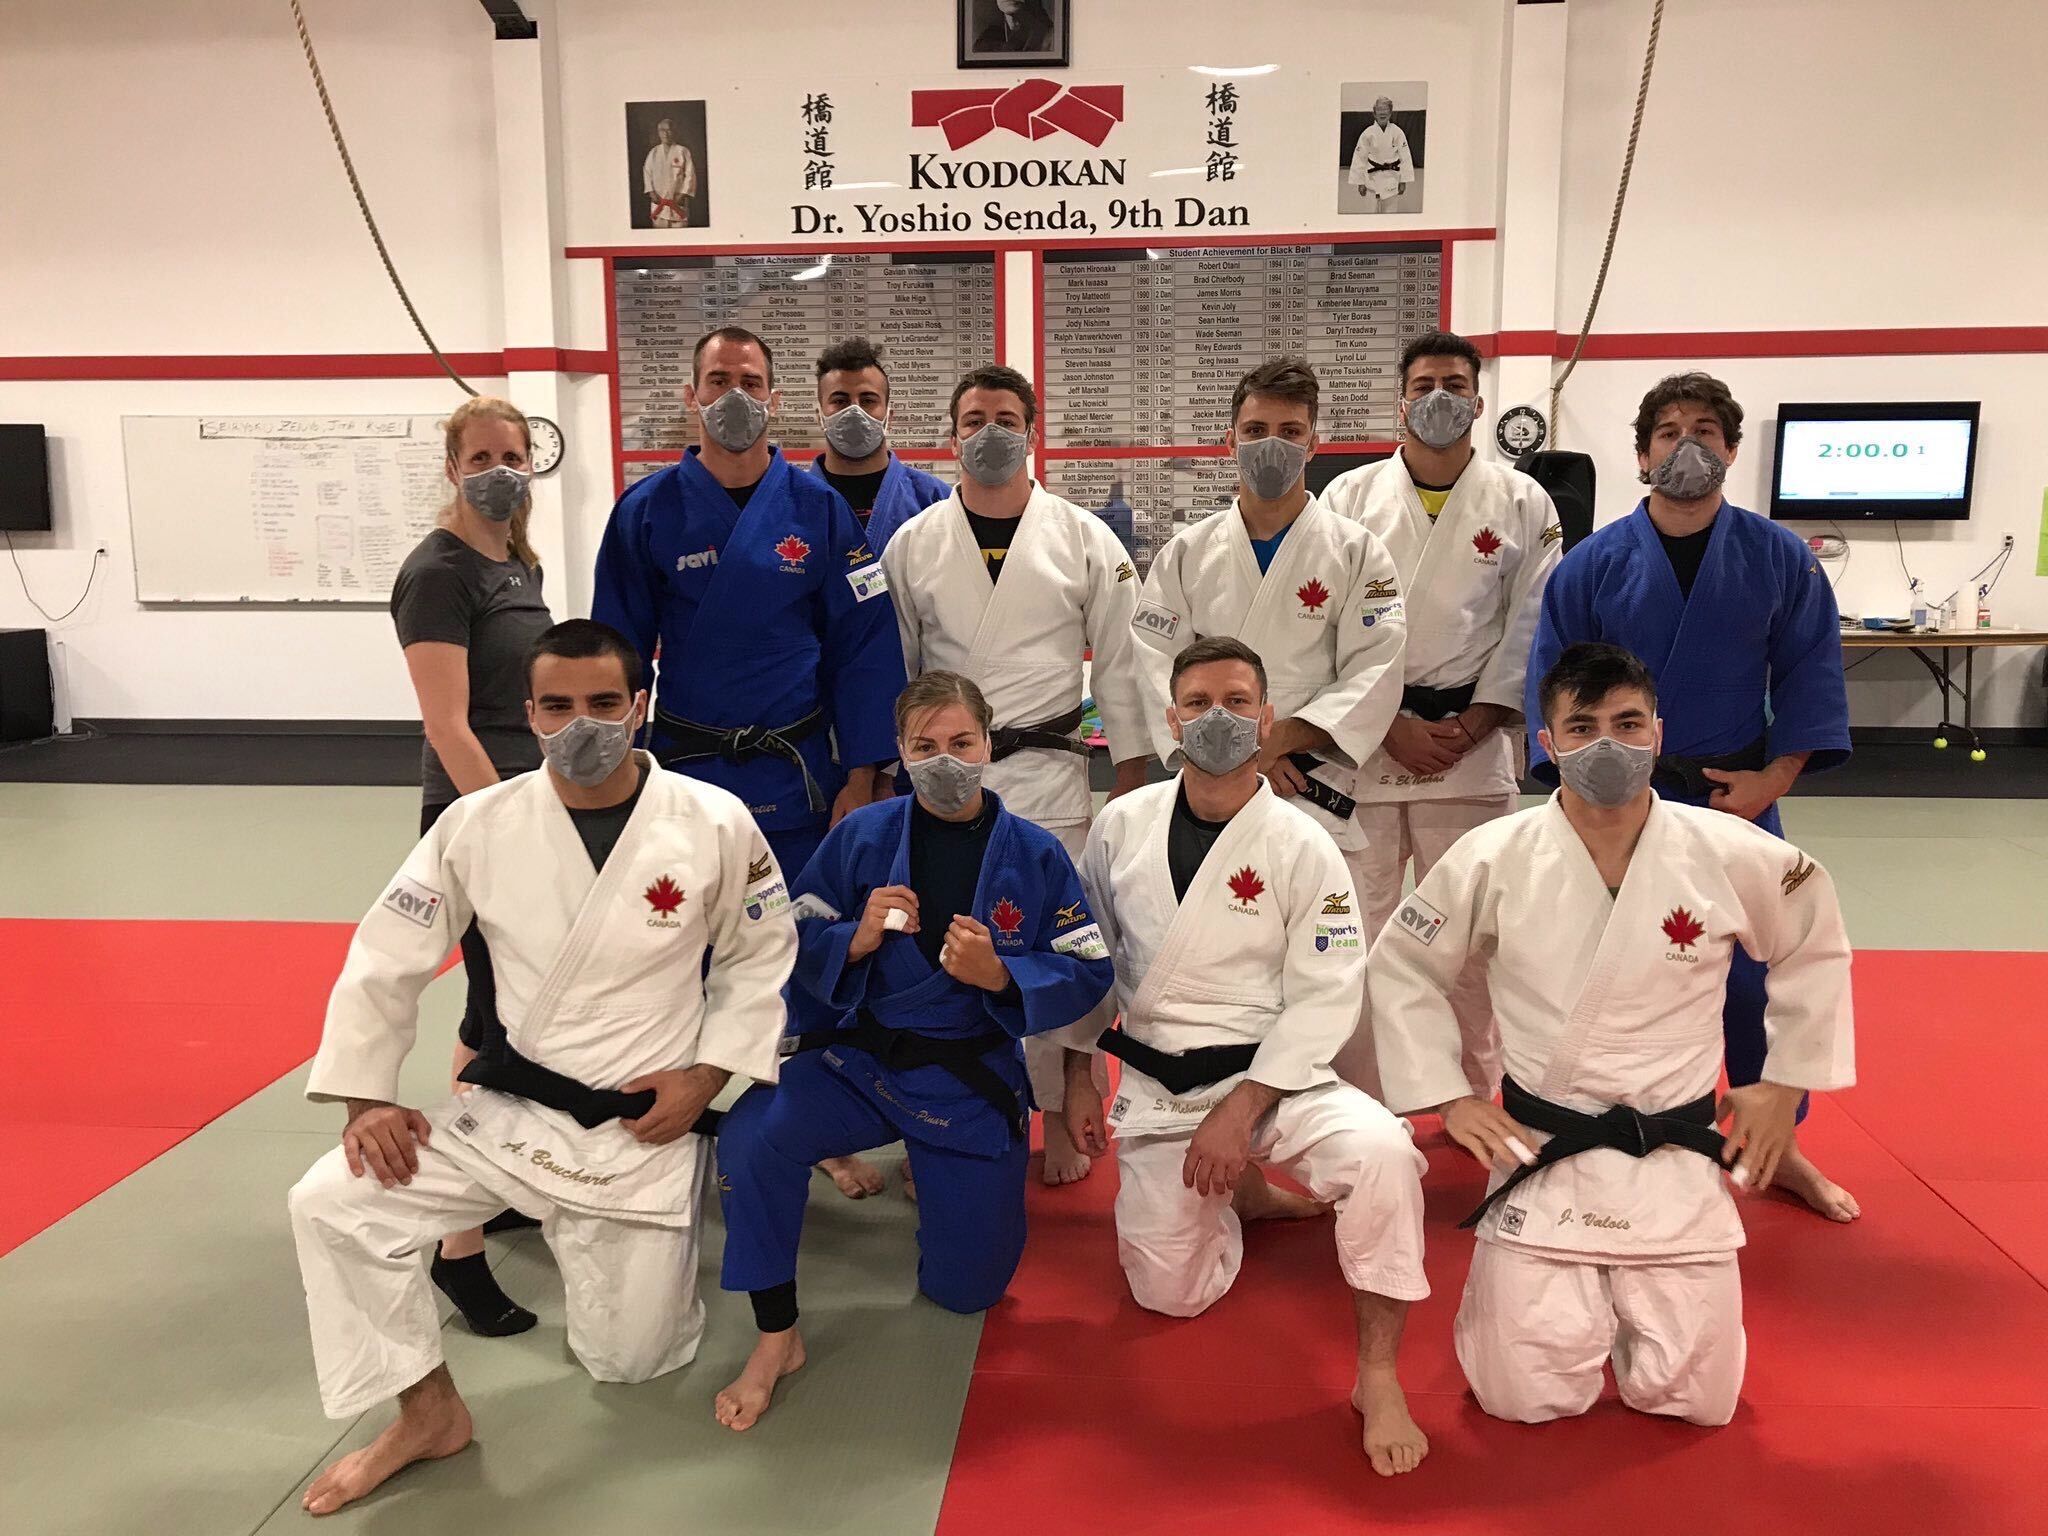 Judo national team members pose wearing masks in the dojo